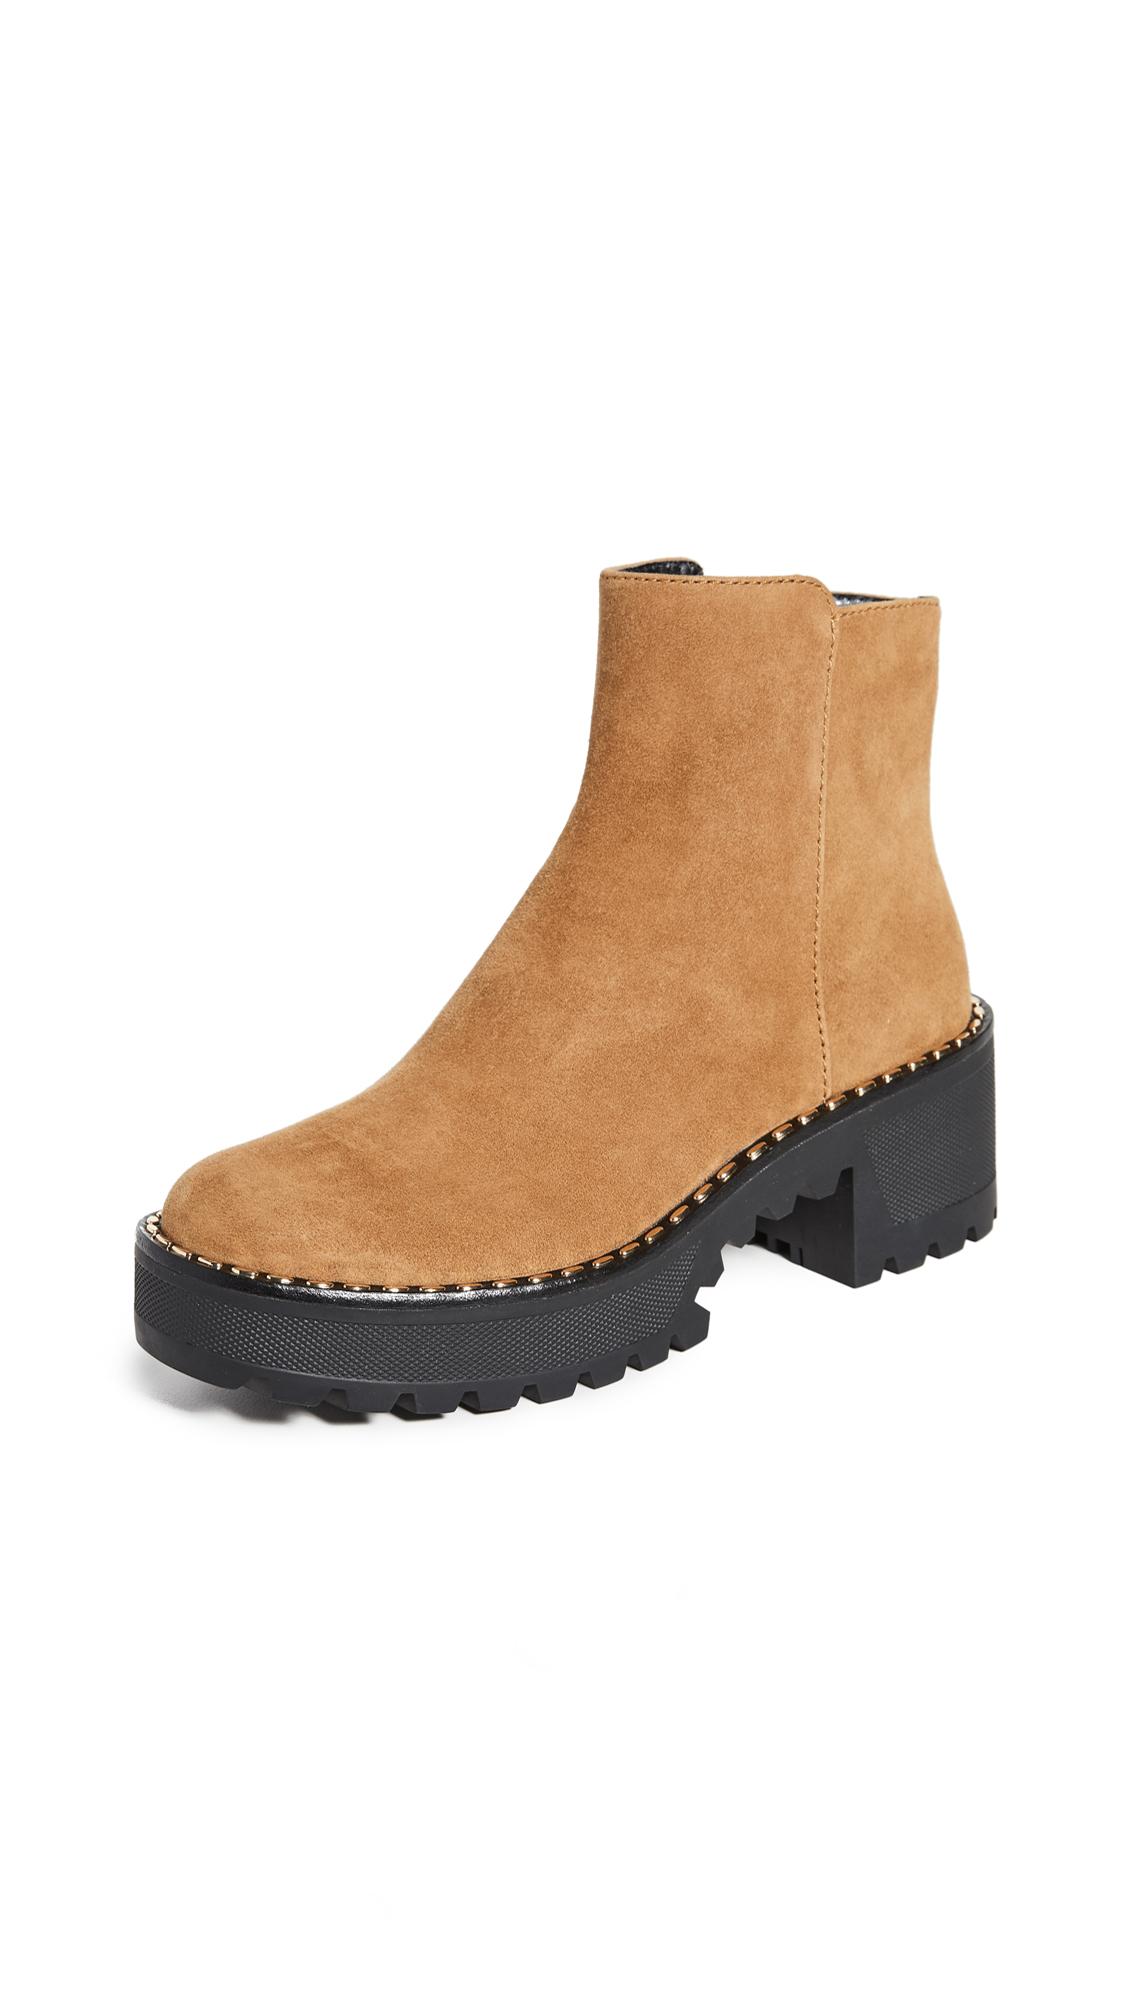 Buy Stella Luna Metal Clou Boots online, shop Stella Luna